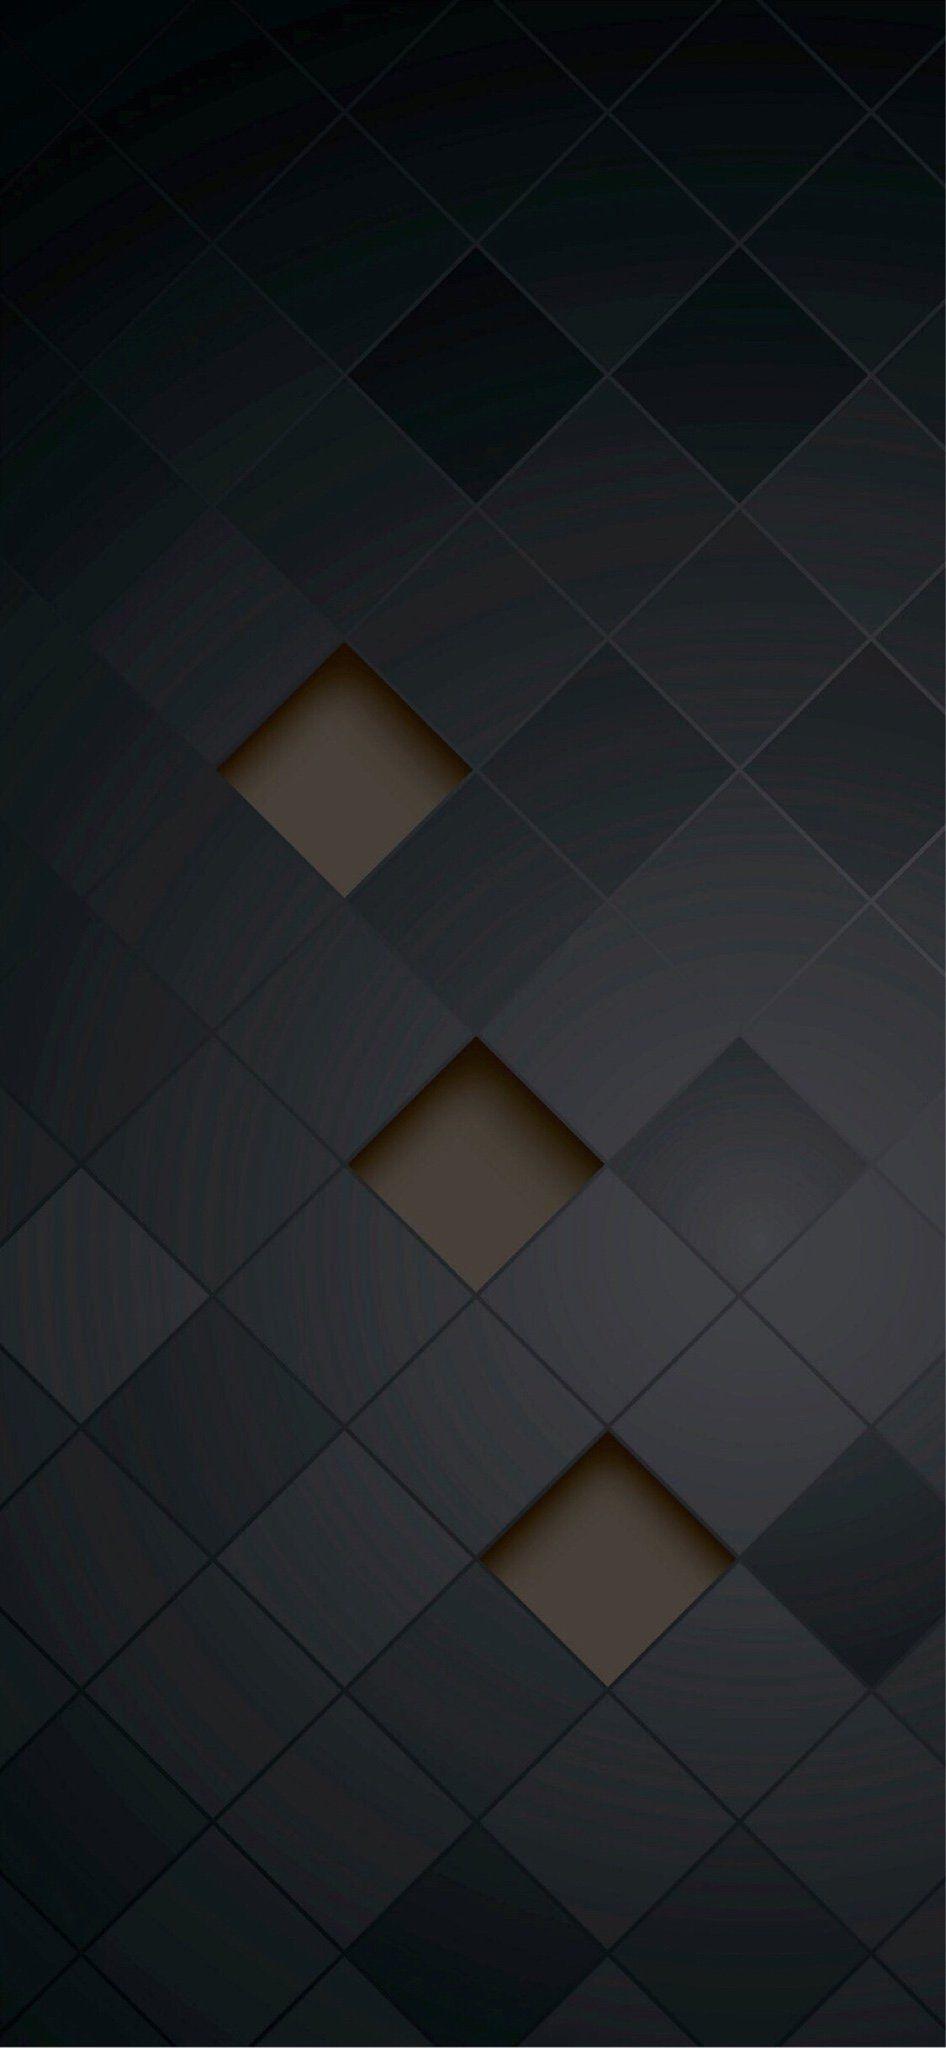 Cool 3d Cool Wallpapers For Phones Original Iphone Wallpaper Android Phone Wallpaper